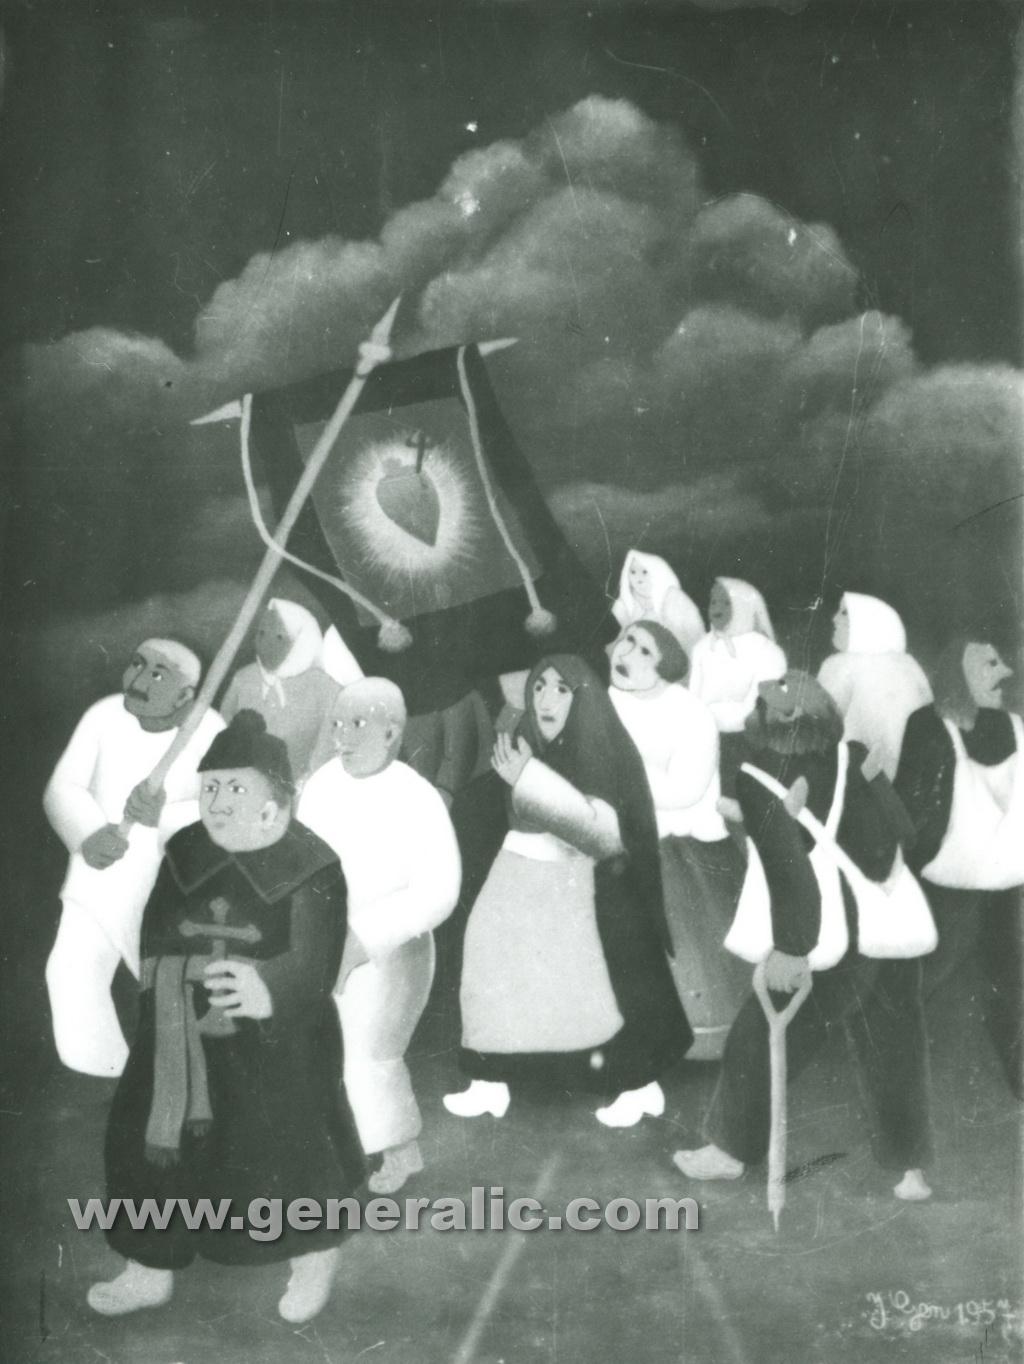 Ivan Generalic, 1957, Procession, oil on glass, 35x45 cm